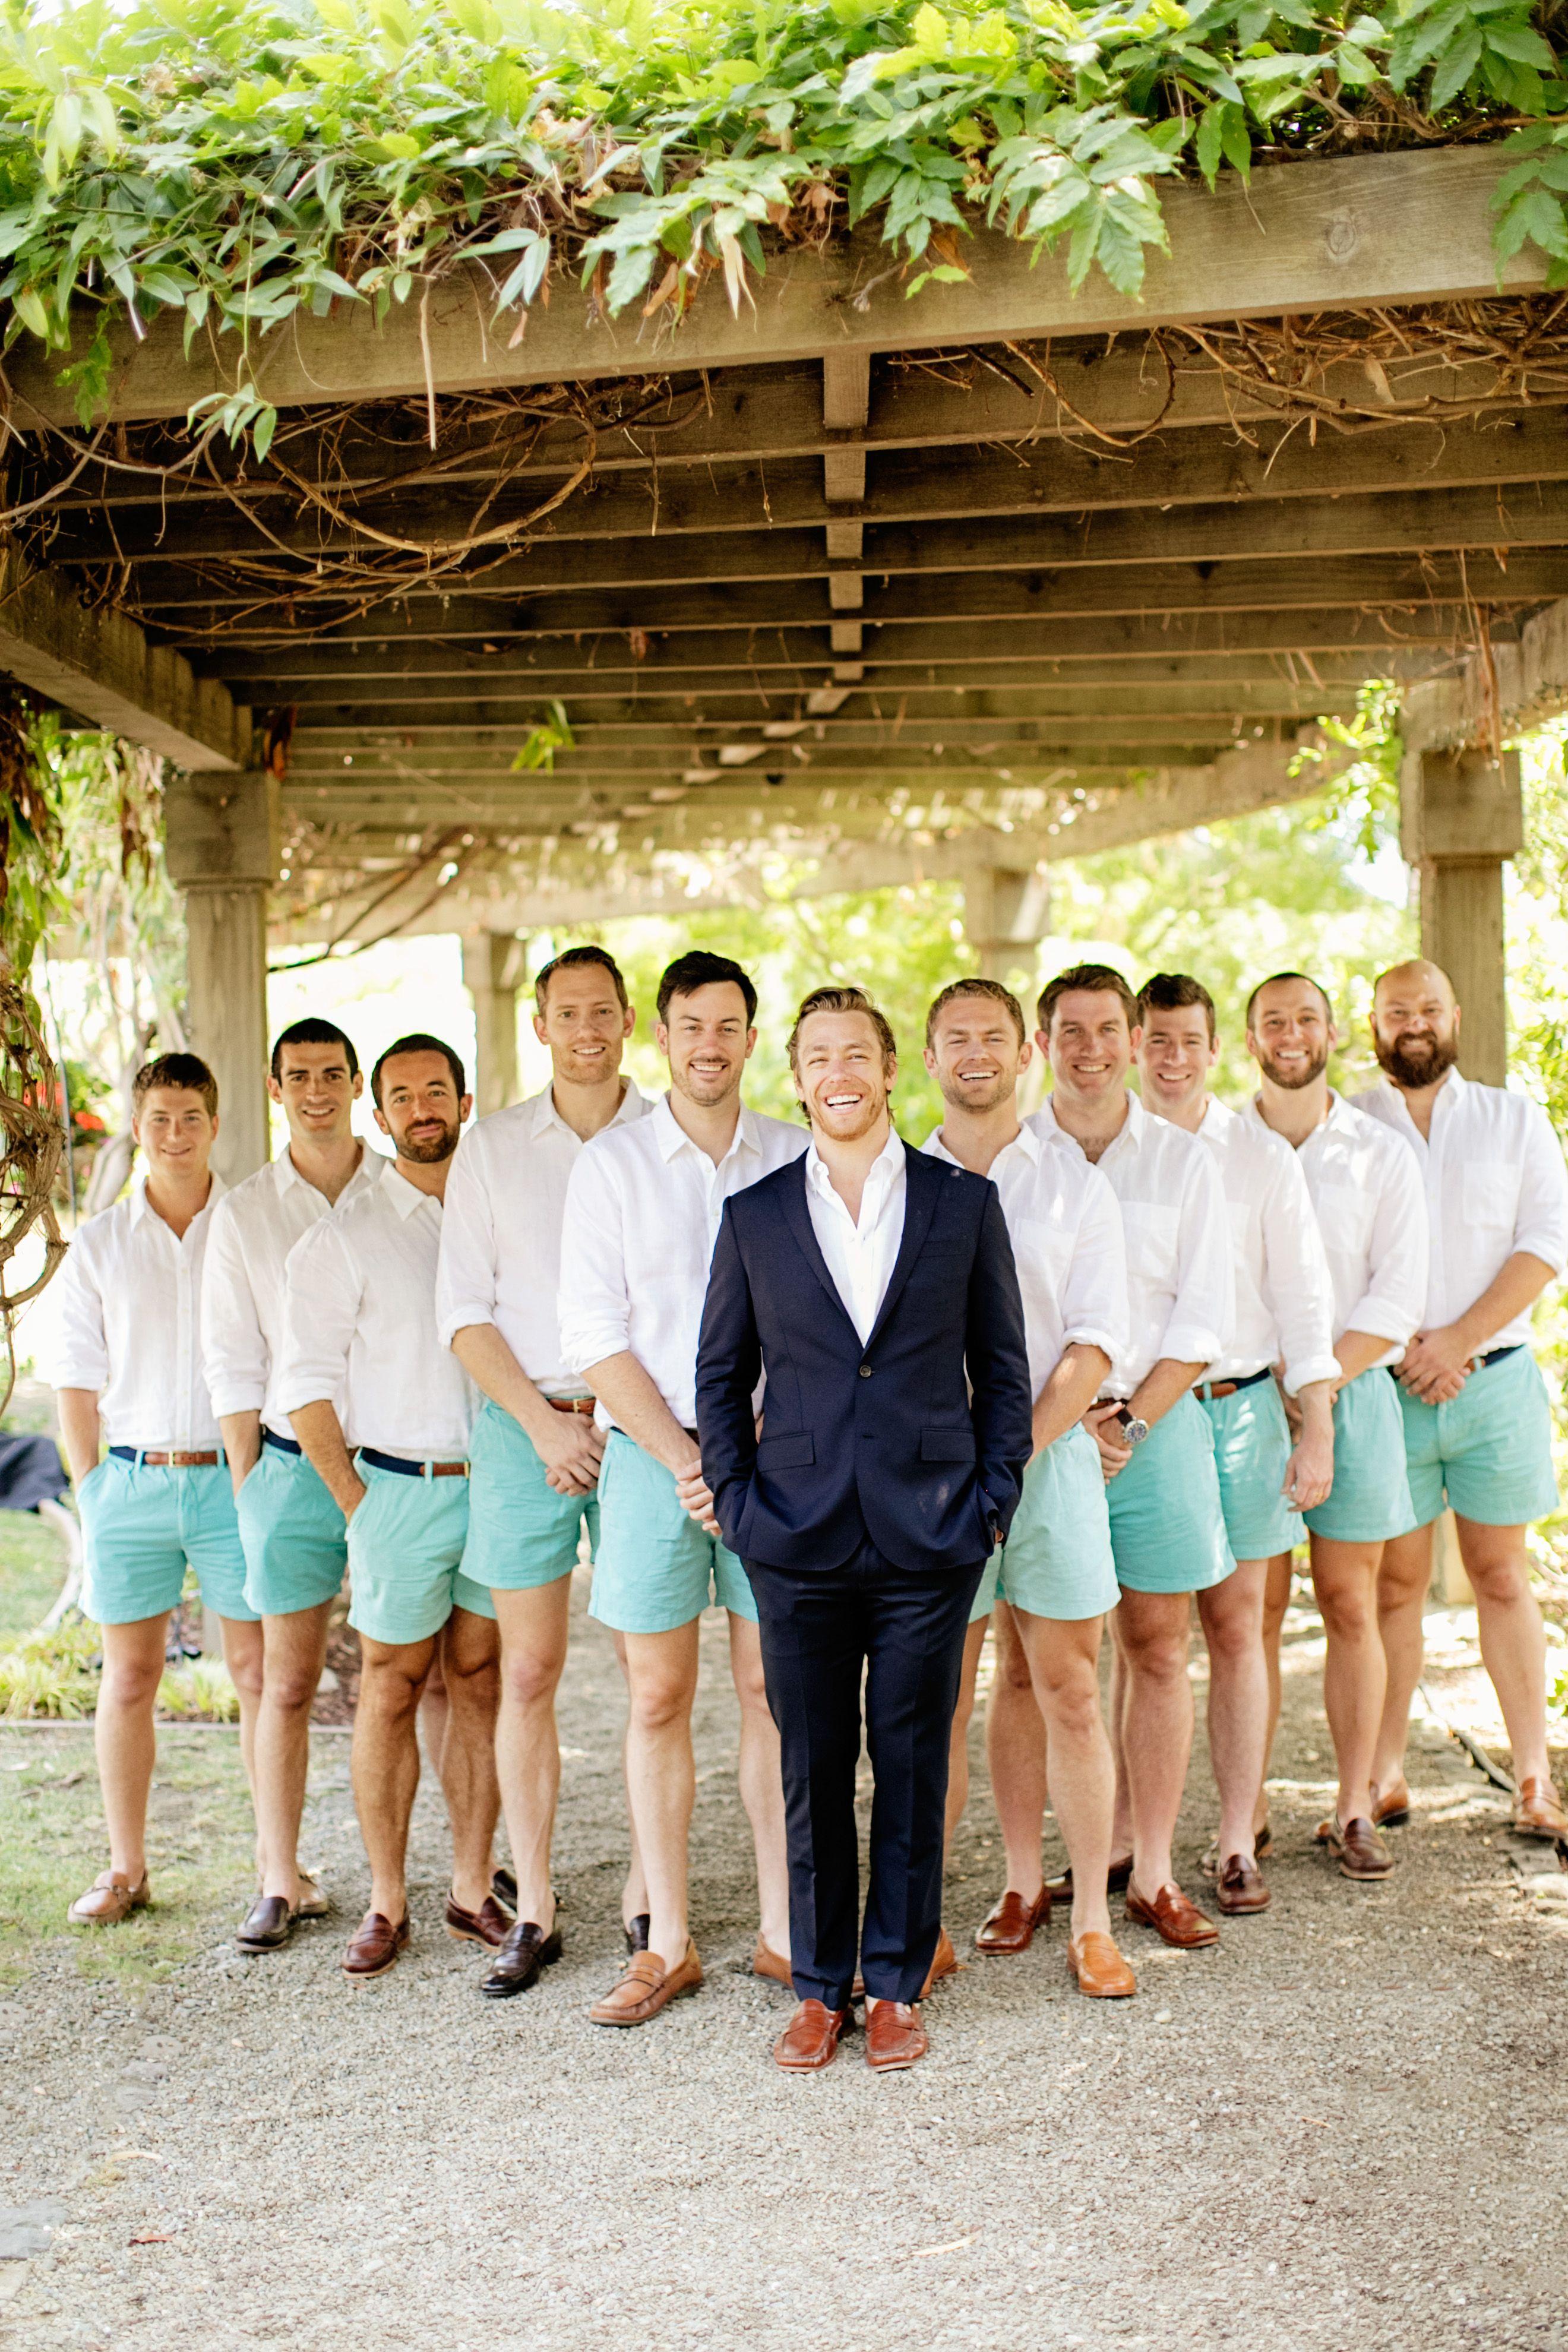 Beach wedding idea groomsmen attire for